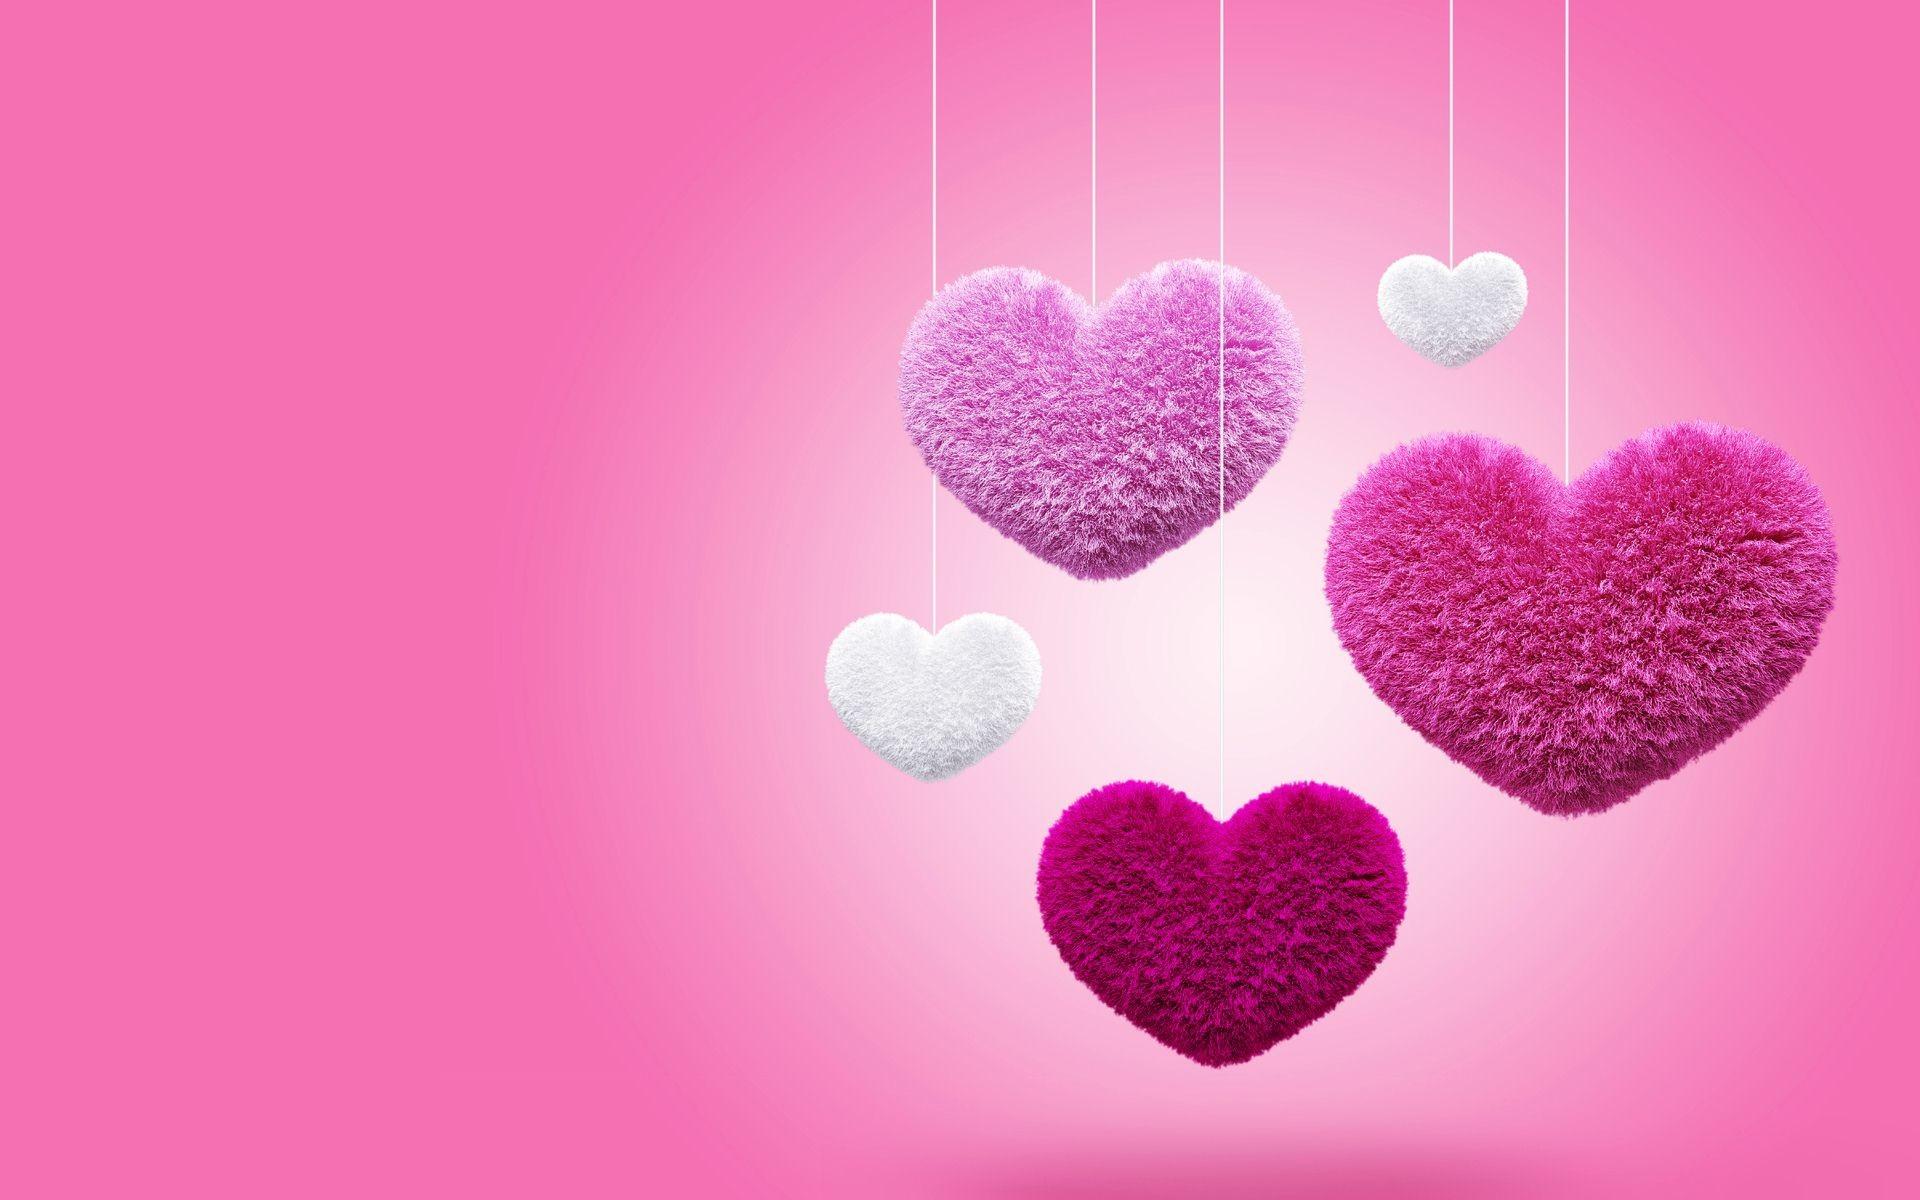 Pink Love Wallpaper 64 Images